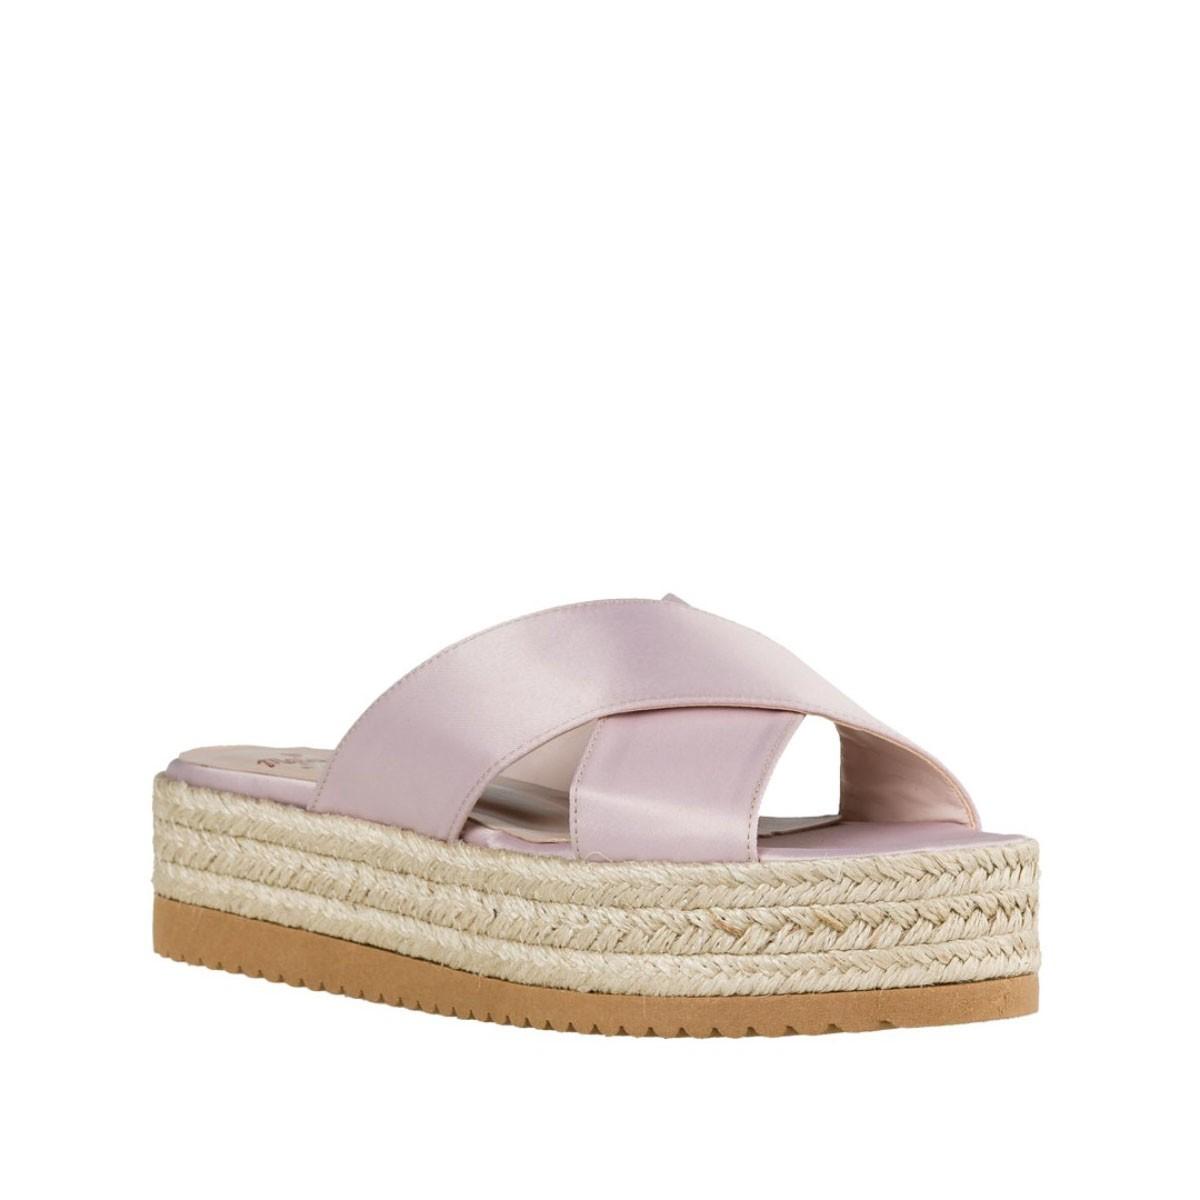 BagiotaShoes - Κορυφαία προϊόντα για ολοκληρωμένα Outfit - Σελίδα 18 ... 14f3c5b8fa2